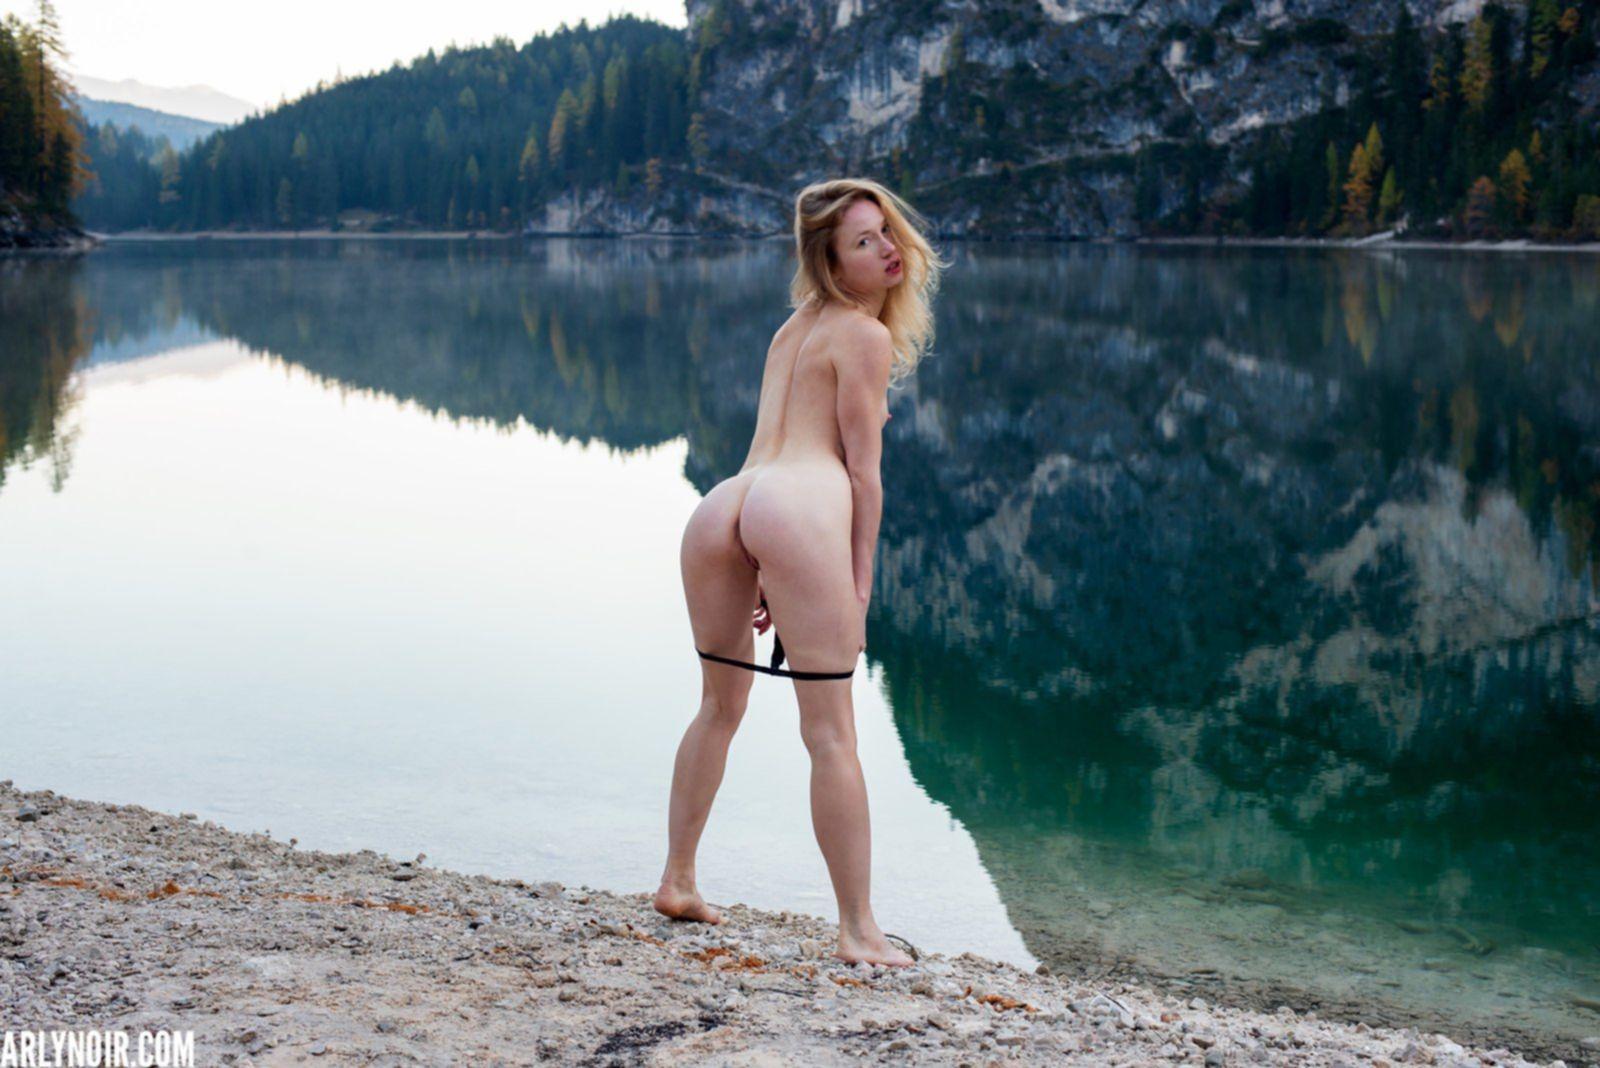 Голая блондинка на фоне красивого пейзажа - фото